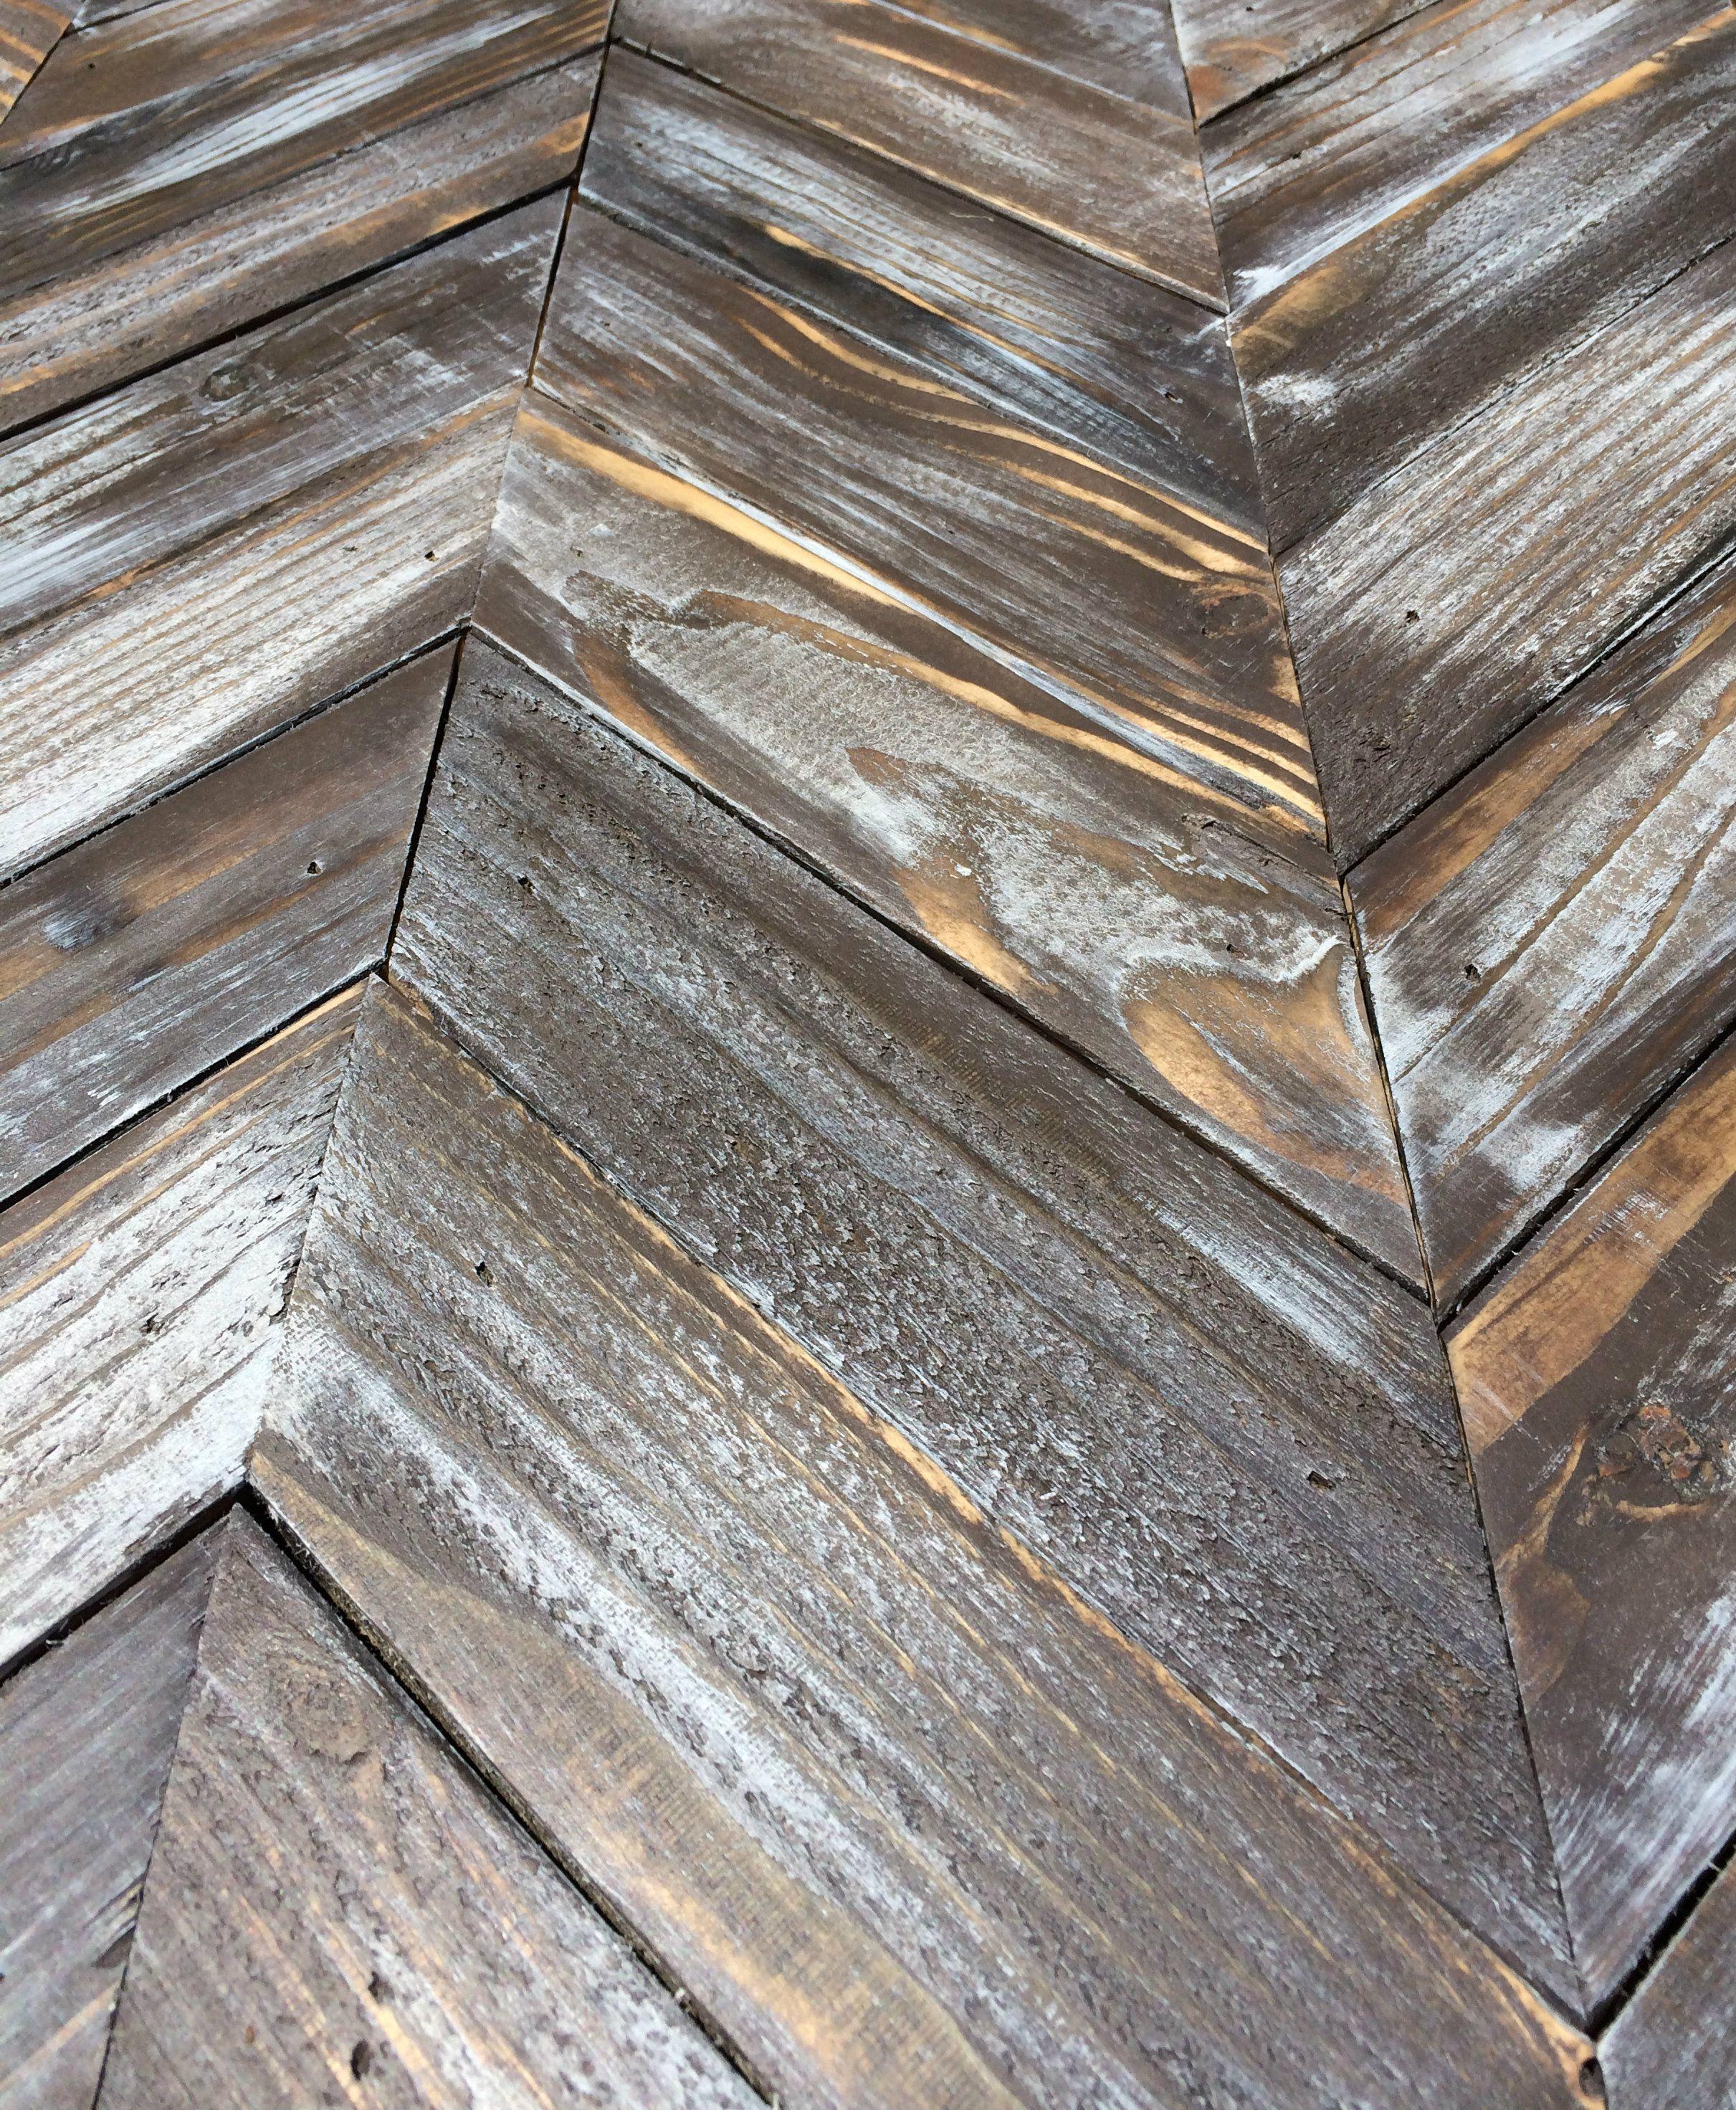 Stupendous Shabby Chic Cedar Strip Photography Background 33X21 5 Download Free Architecture Designs Itiscsunscenecom